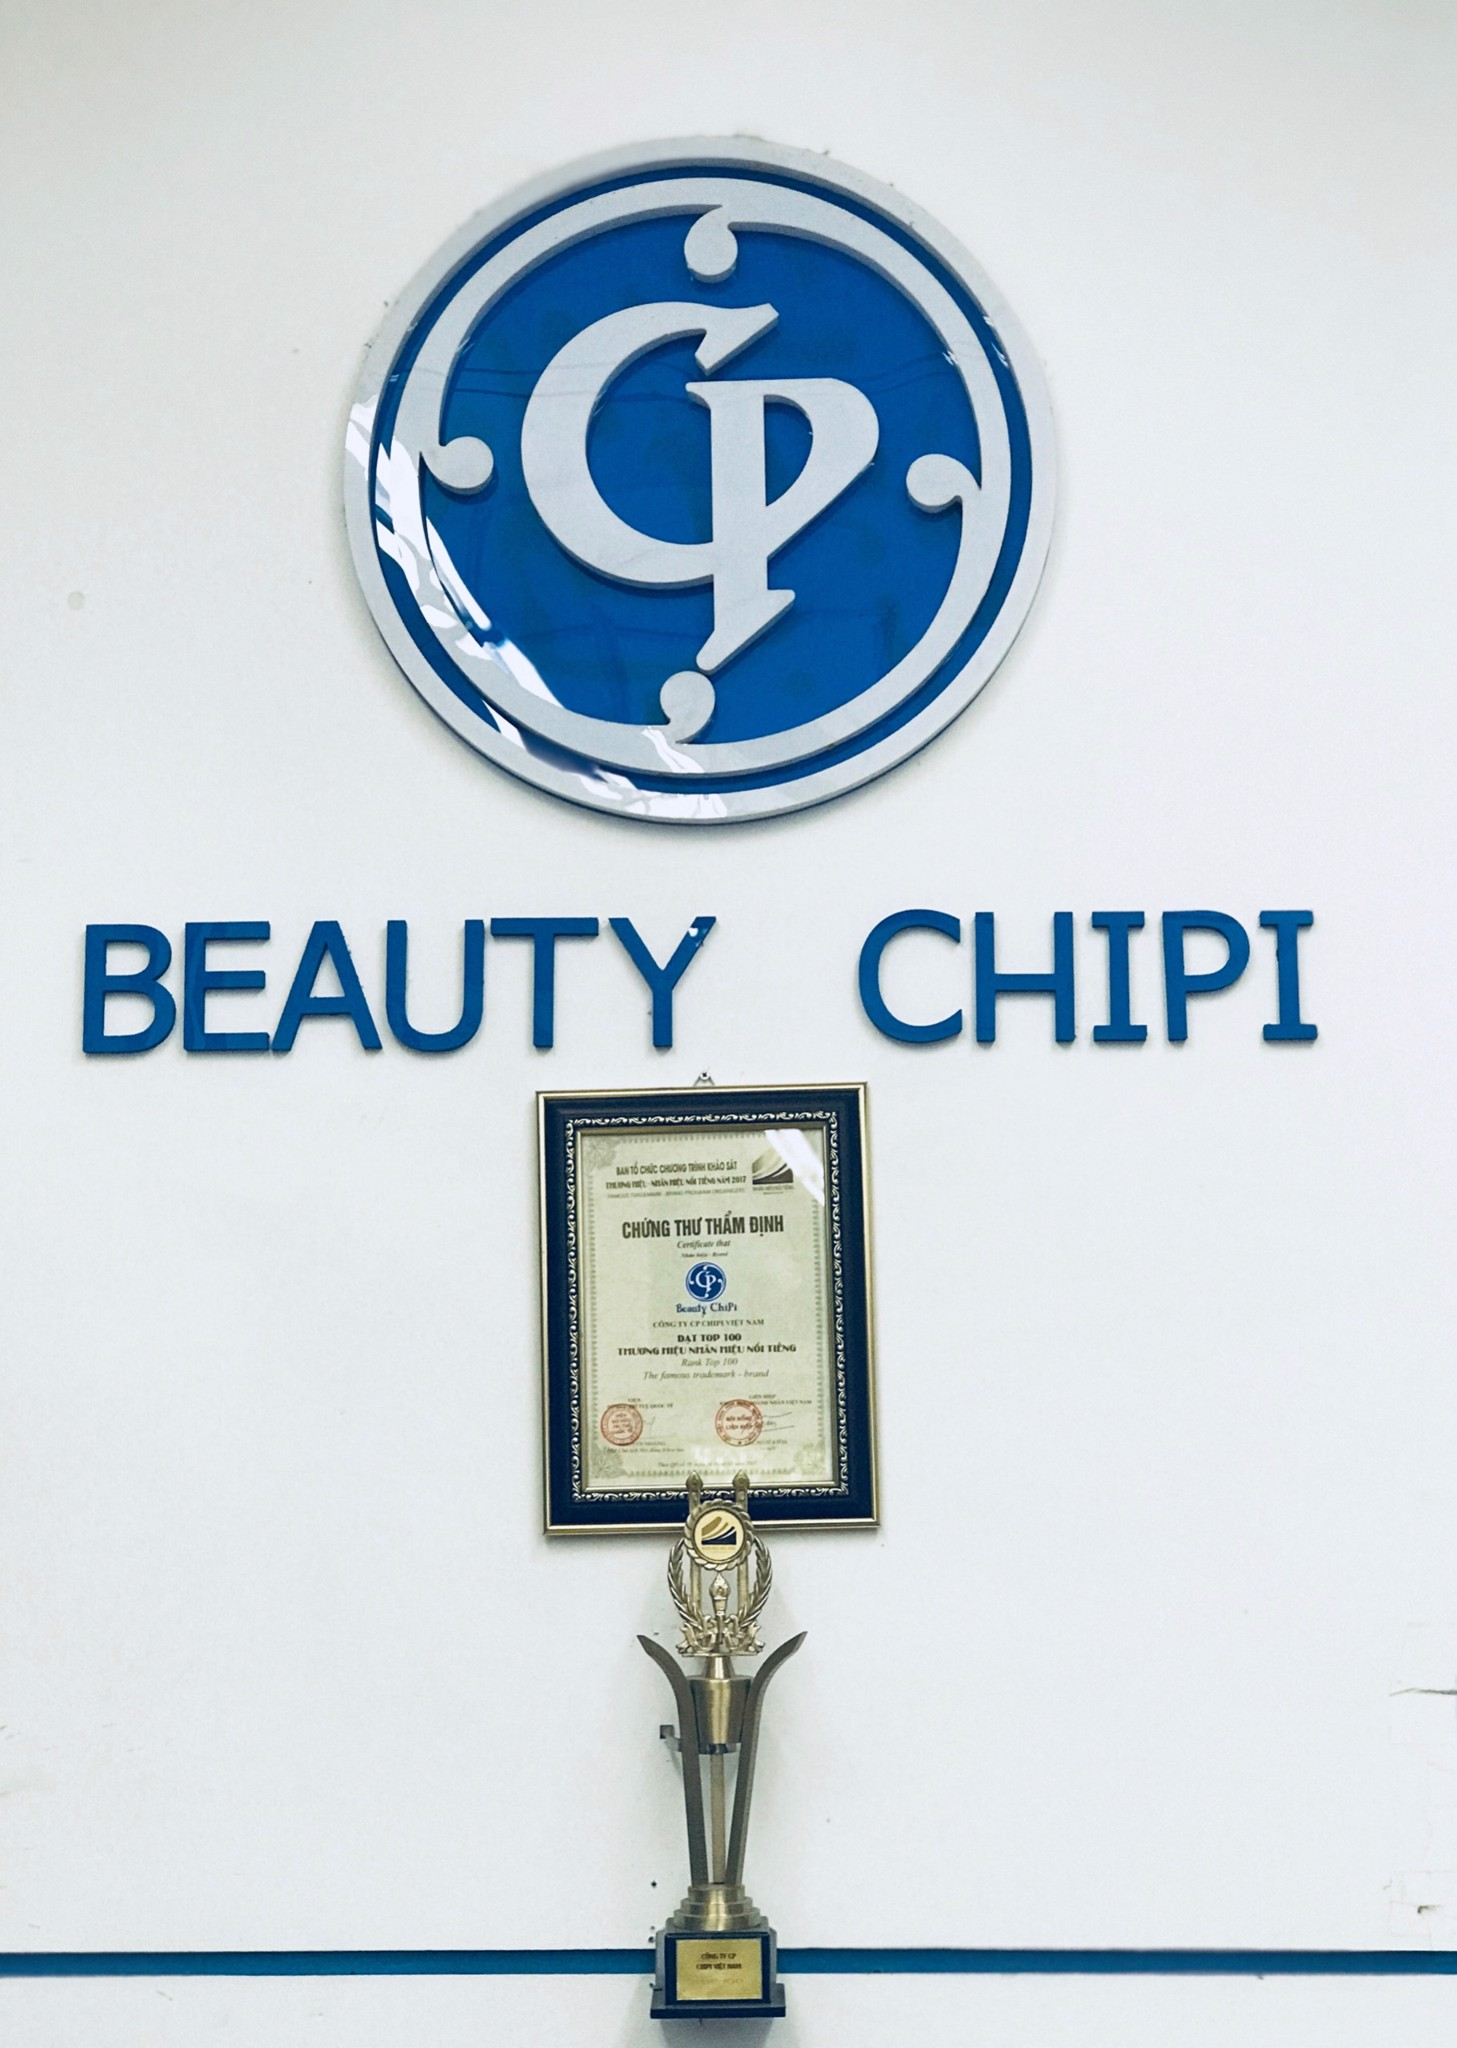 Beauty Chipi